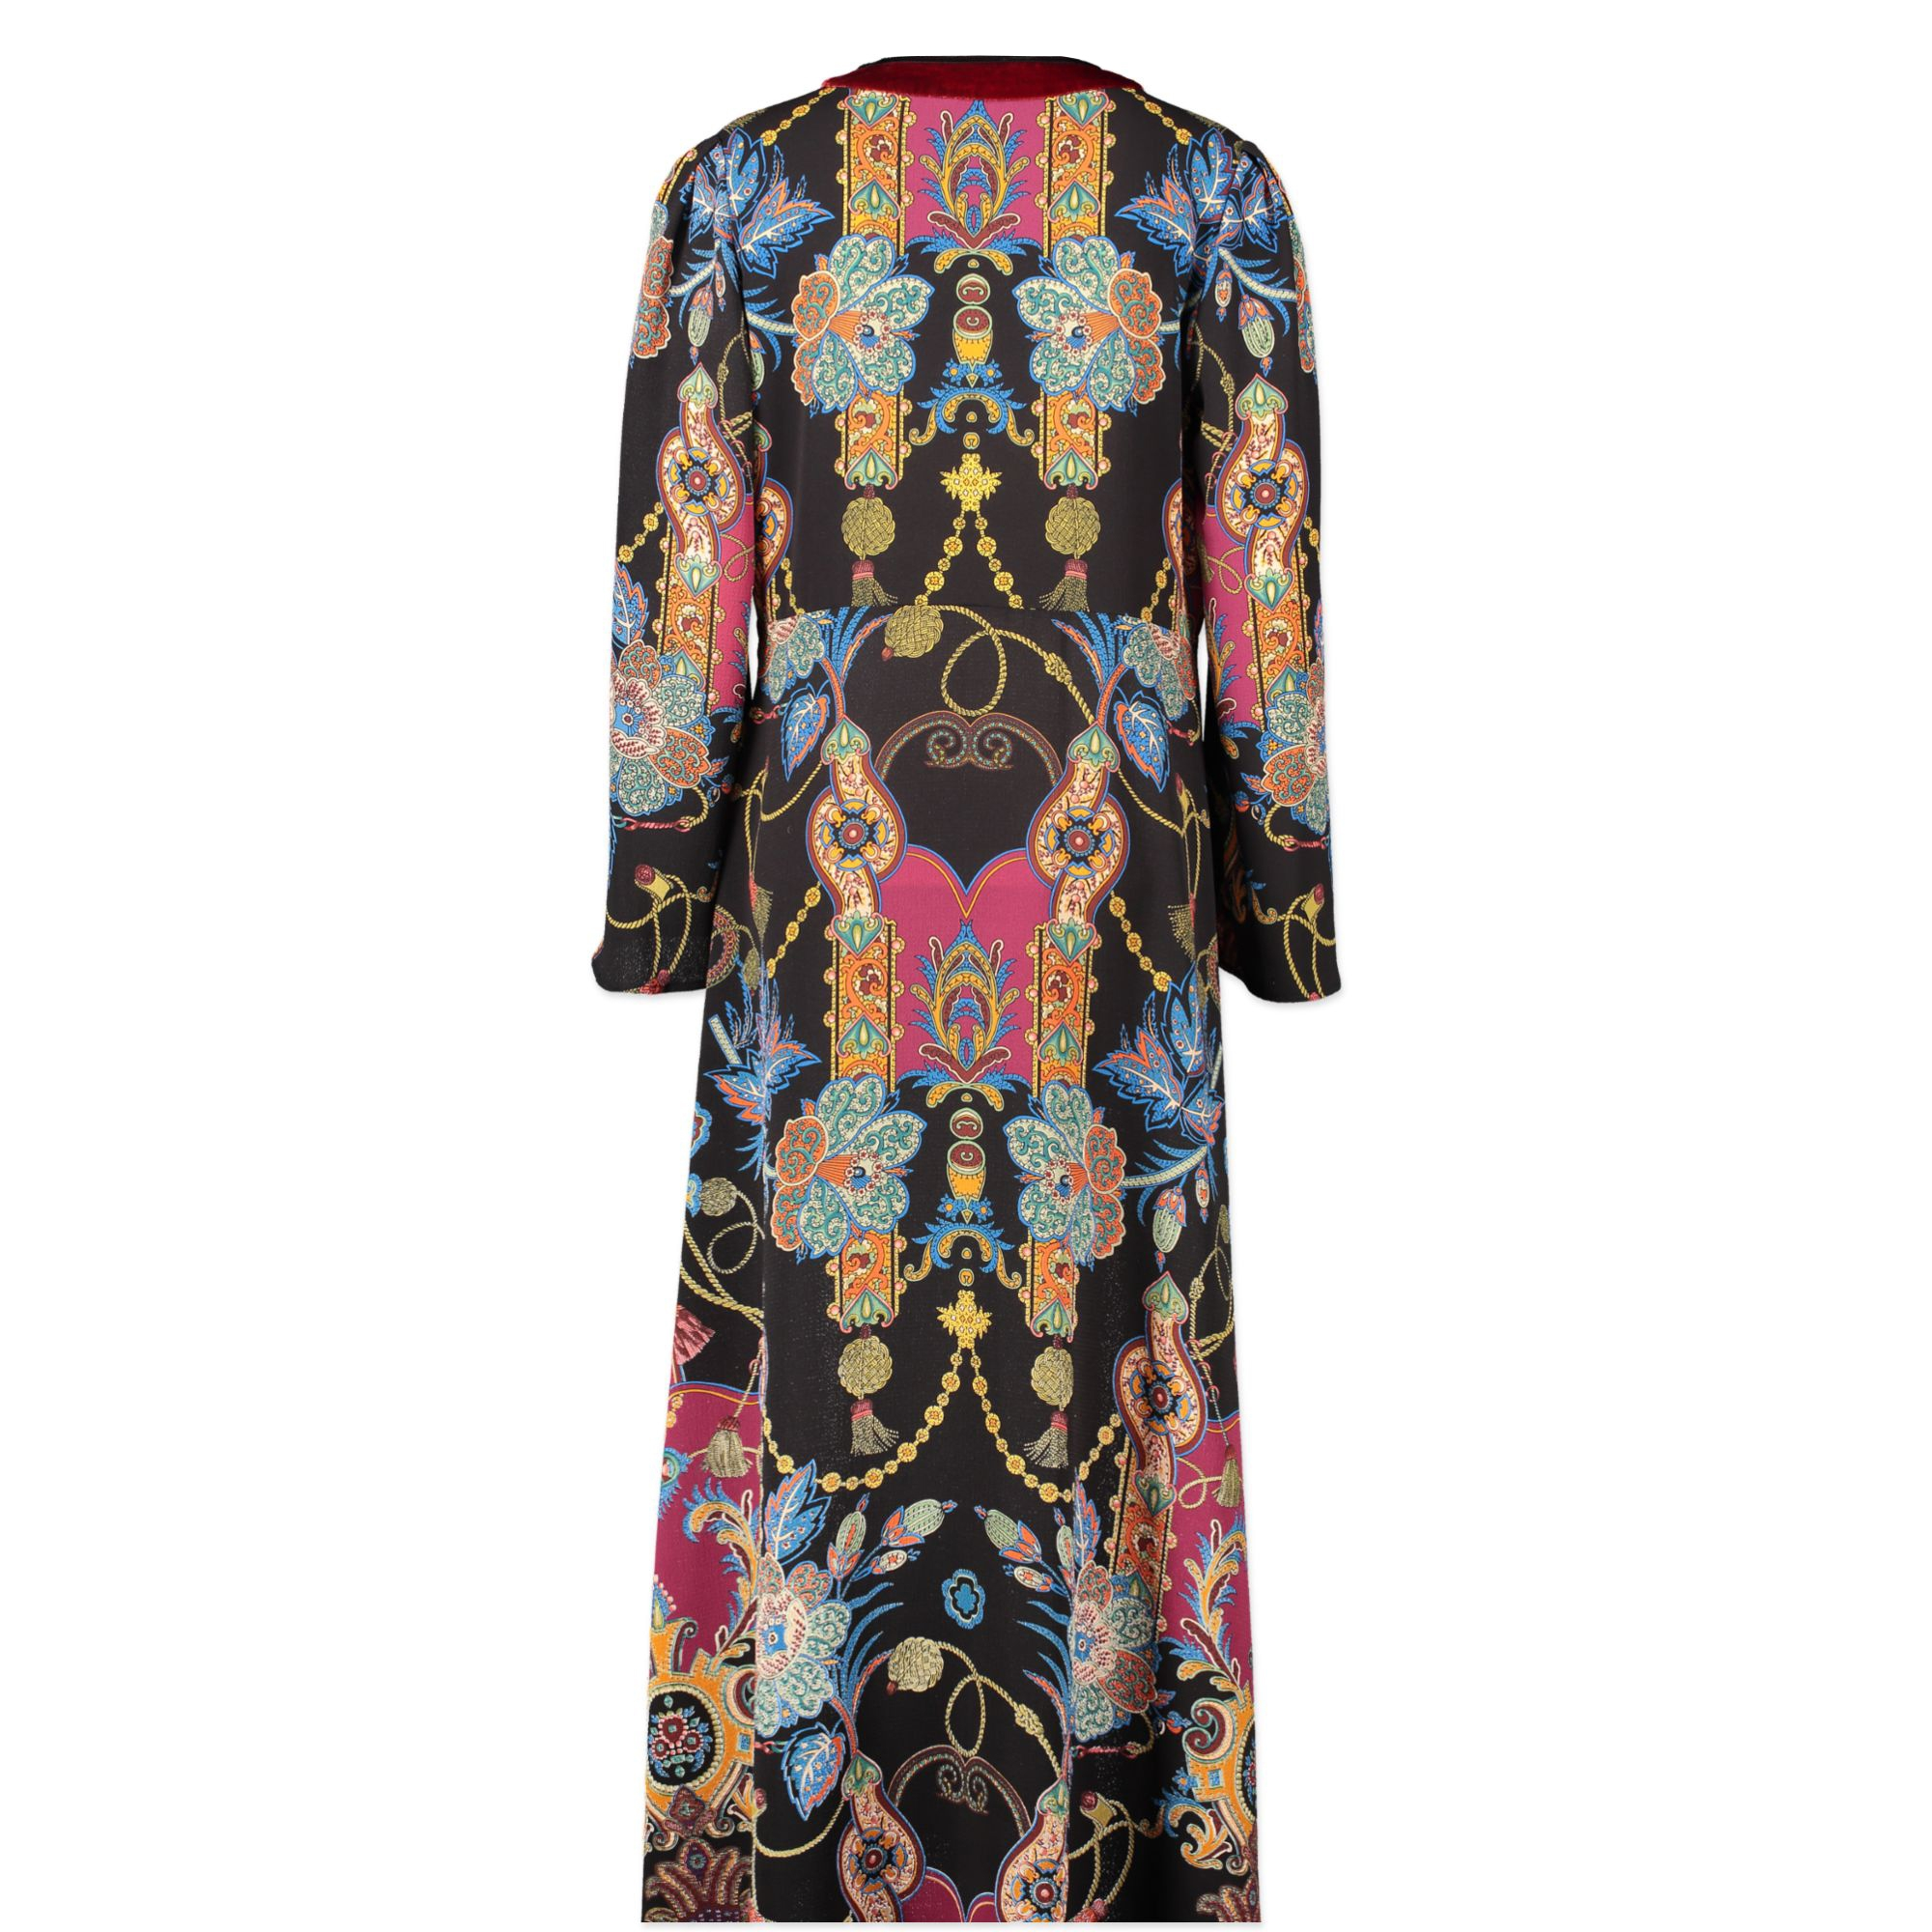 Authentic second-hand vintage Etro Multicolor Velvet V-Neck Dress - Size 46 buy online webshop LabelLOV